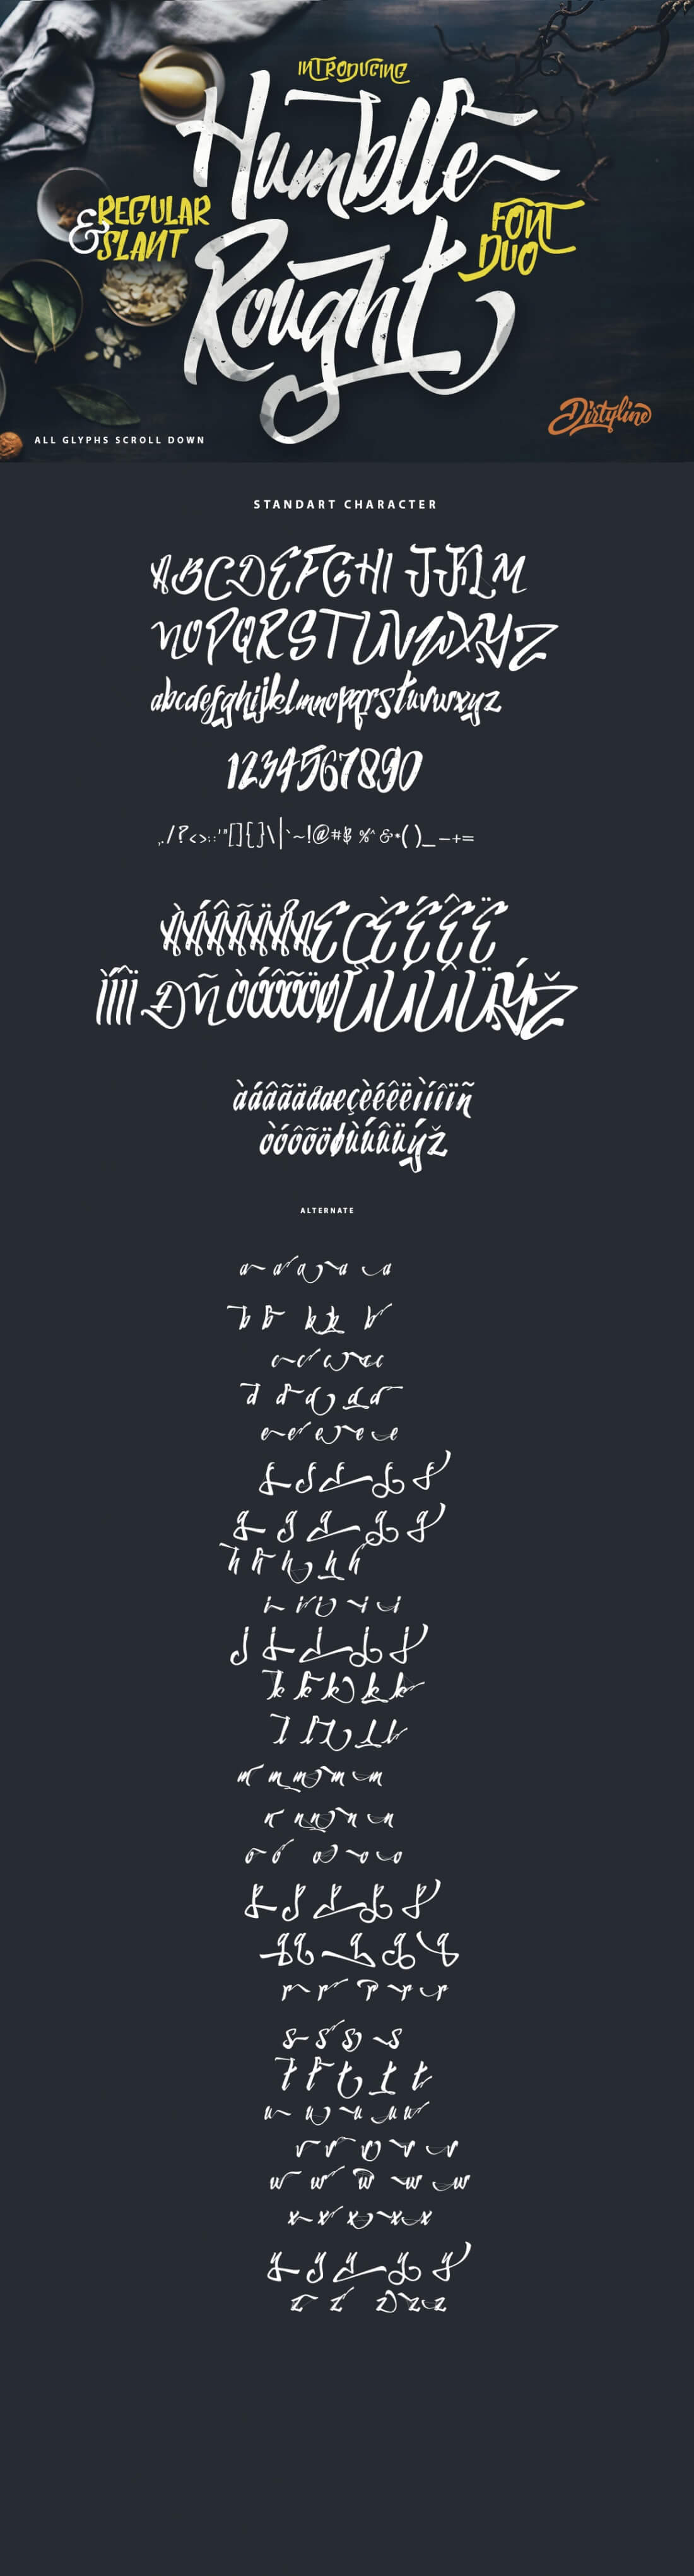 Superb Fonts Bundle of 7 Script & Display Typefaces - only $7 ...